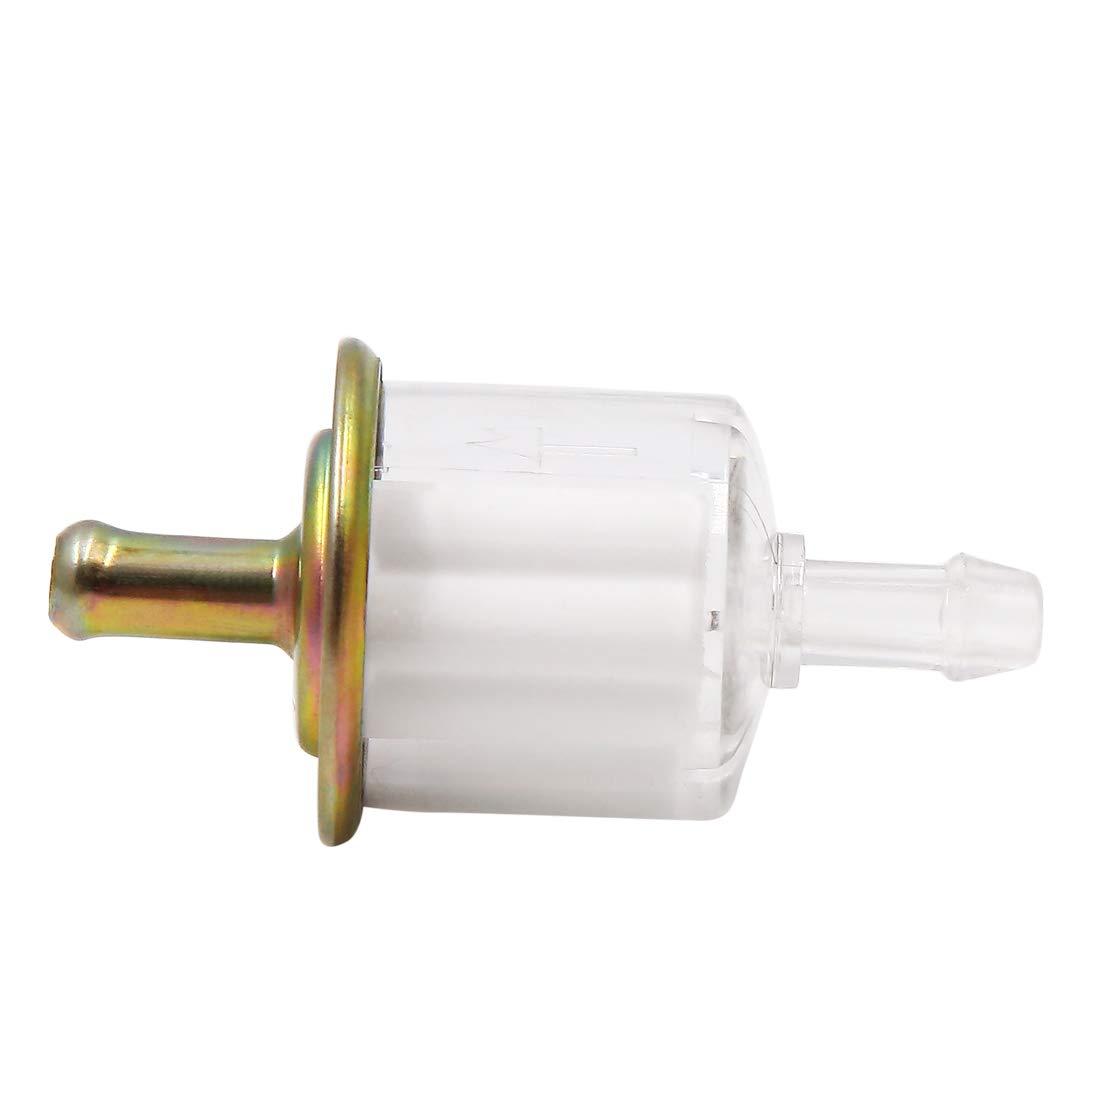 Motorrad Benzinfilter Universal Pertol Inline Gas Kraftstofffilter 60x31mm sourcing map 2Stk